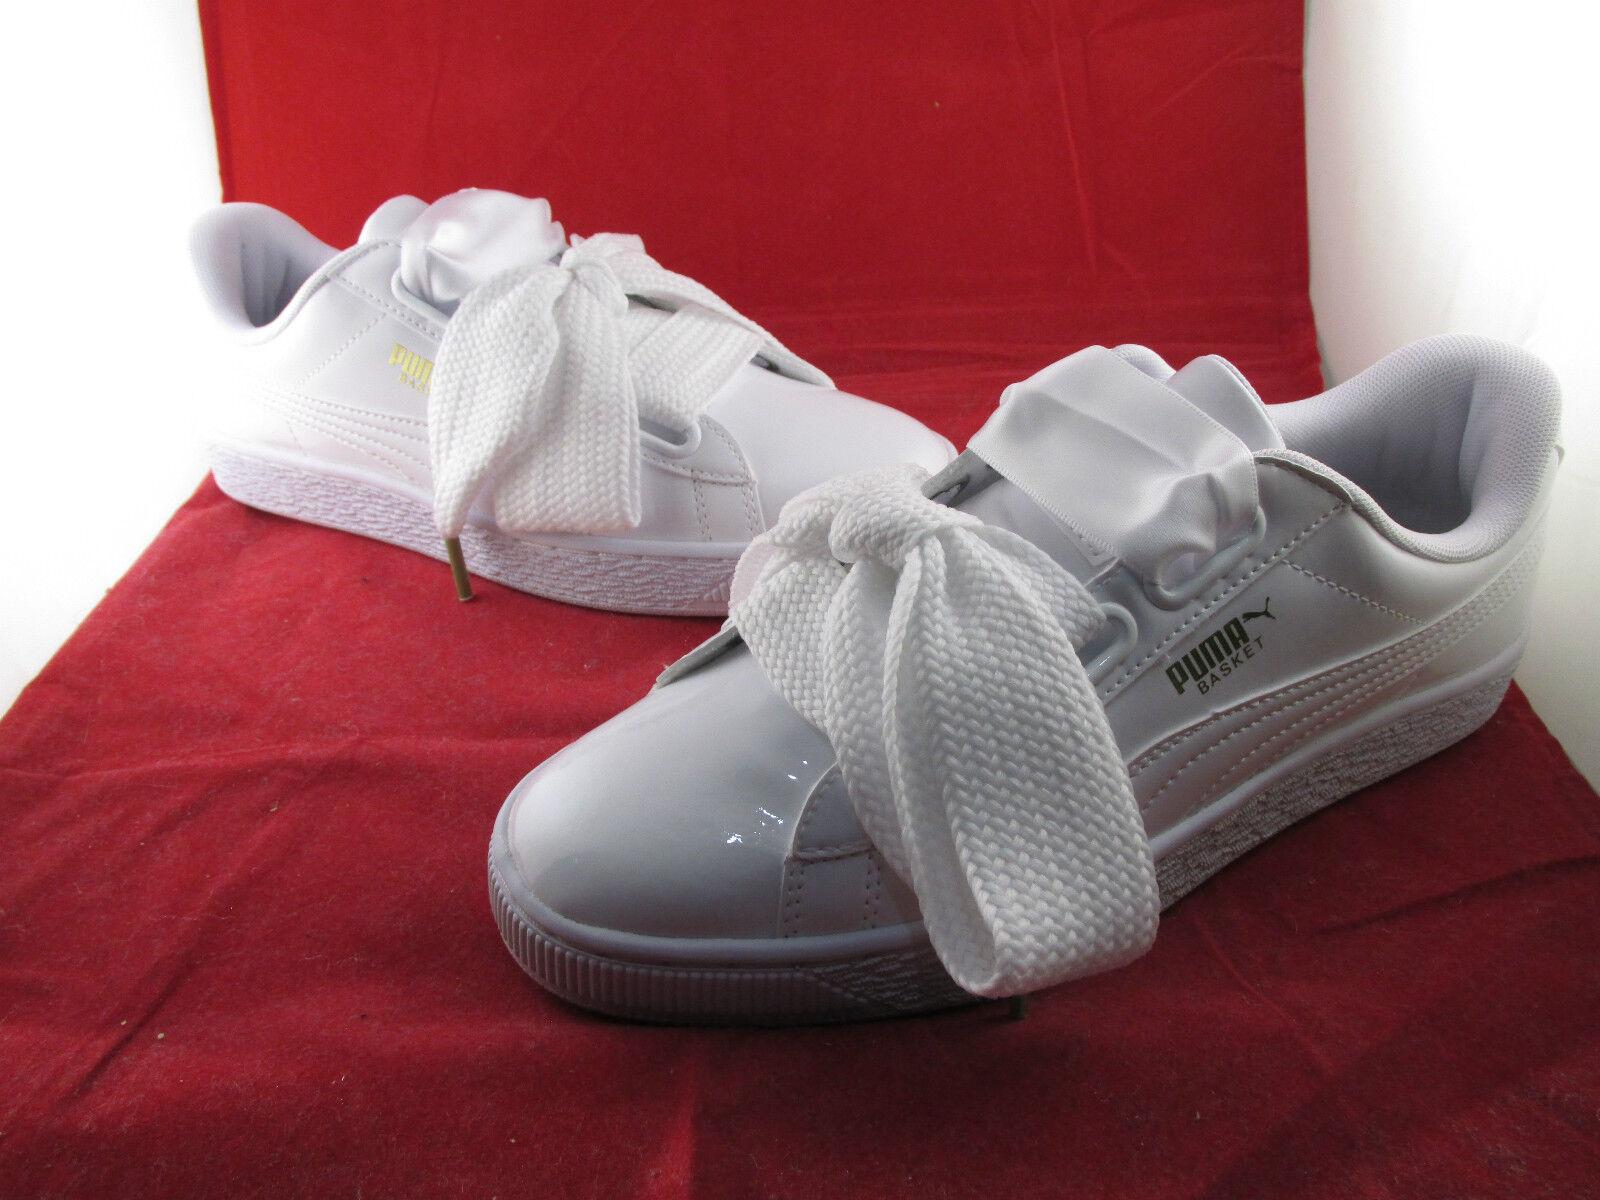 Puma Basket Heart Patent Woman White 3 4 5 6 All Comfortable Cheap women's shoes women's shoes